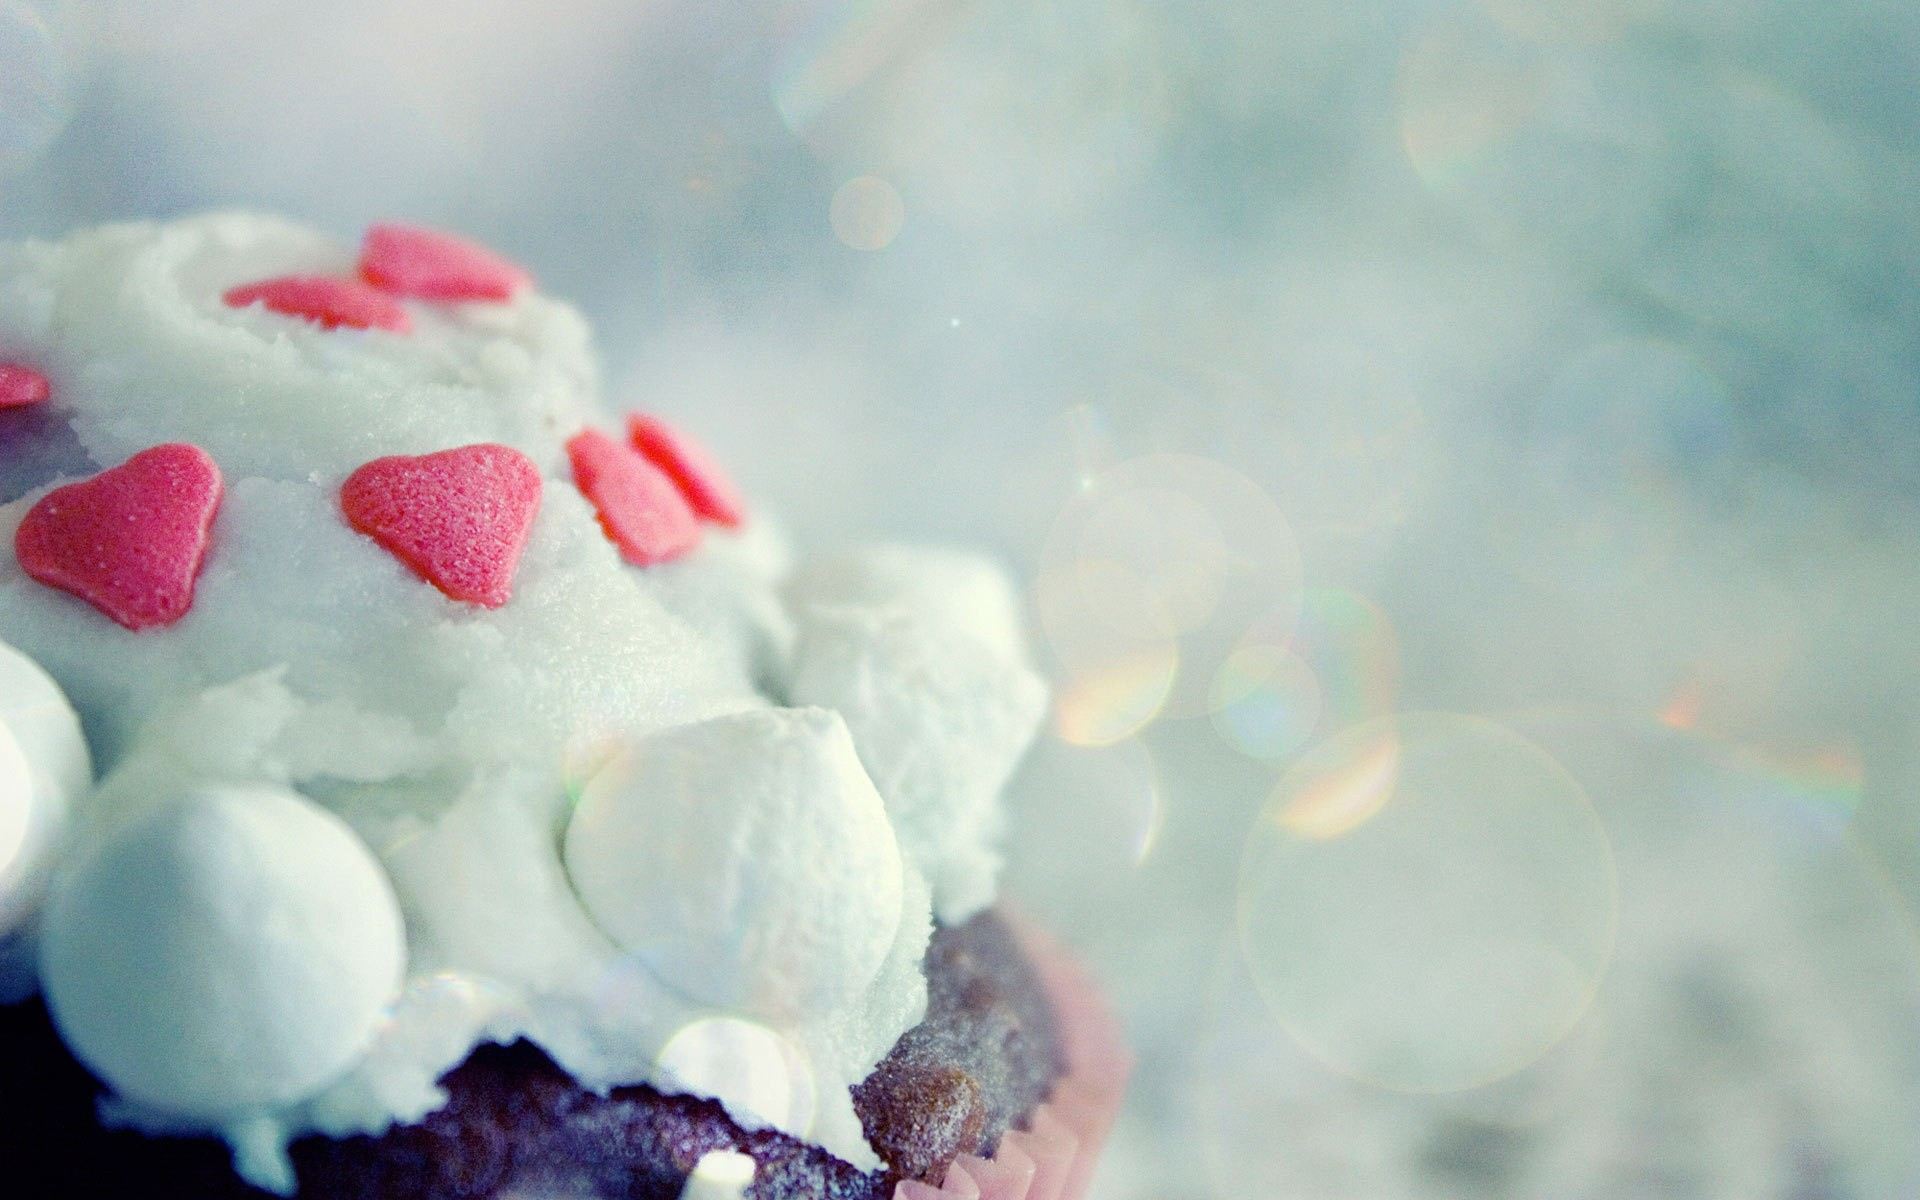 Fall Wallpaper Hd Free Cupcake Backgrounds Download Pixelstalk Net